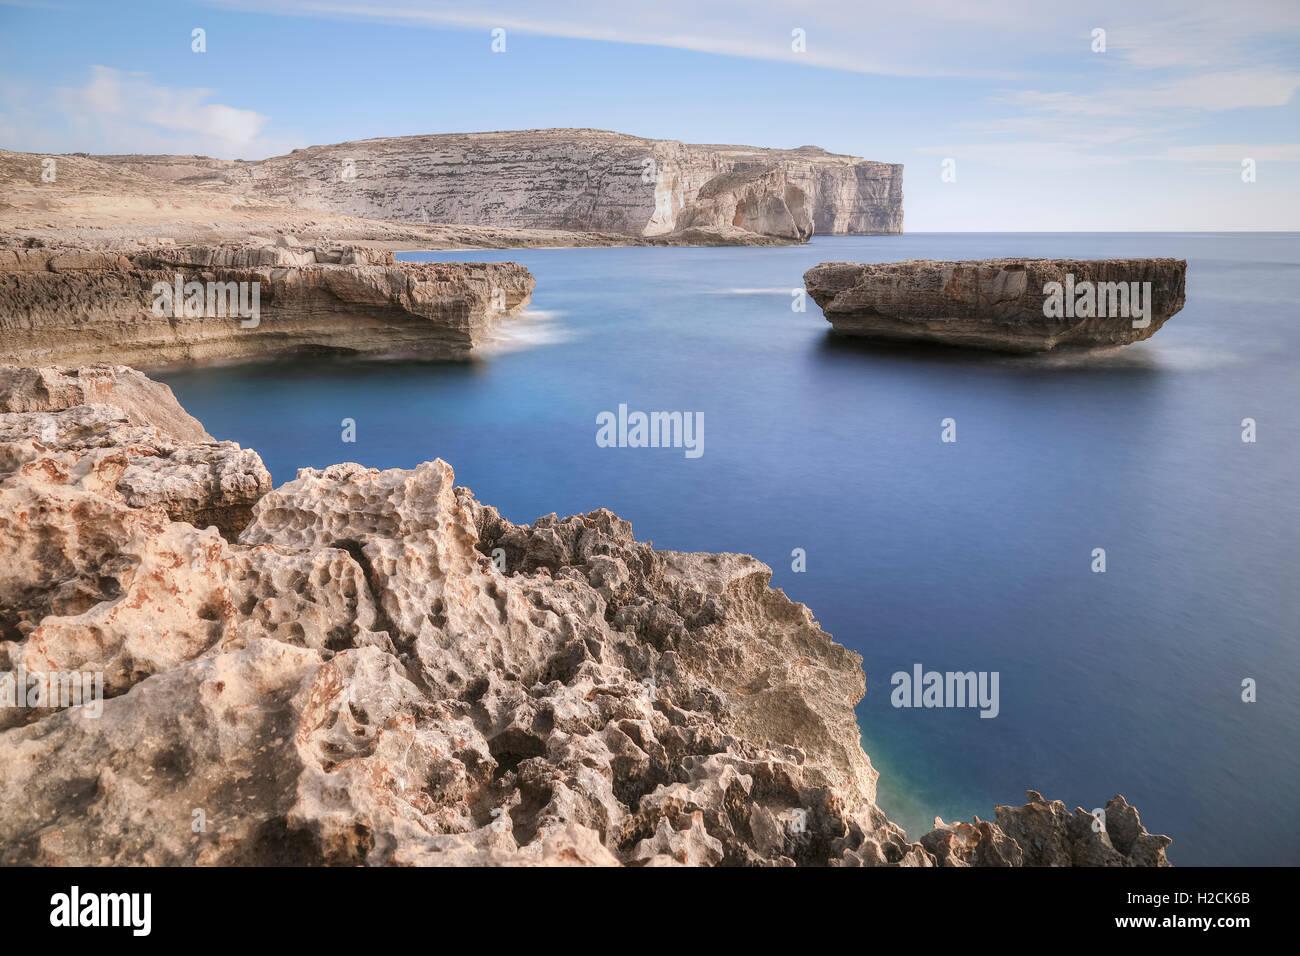 Fungus Rock, Dwejra Bay, Gozo, Malta - Stock Image